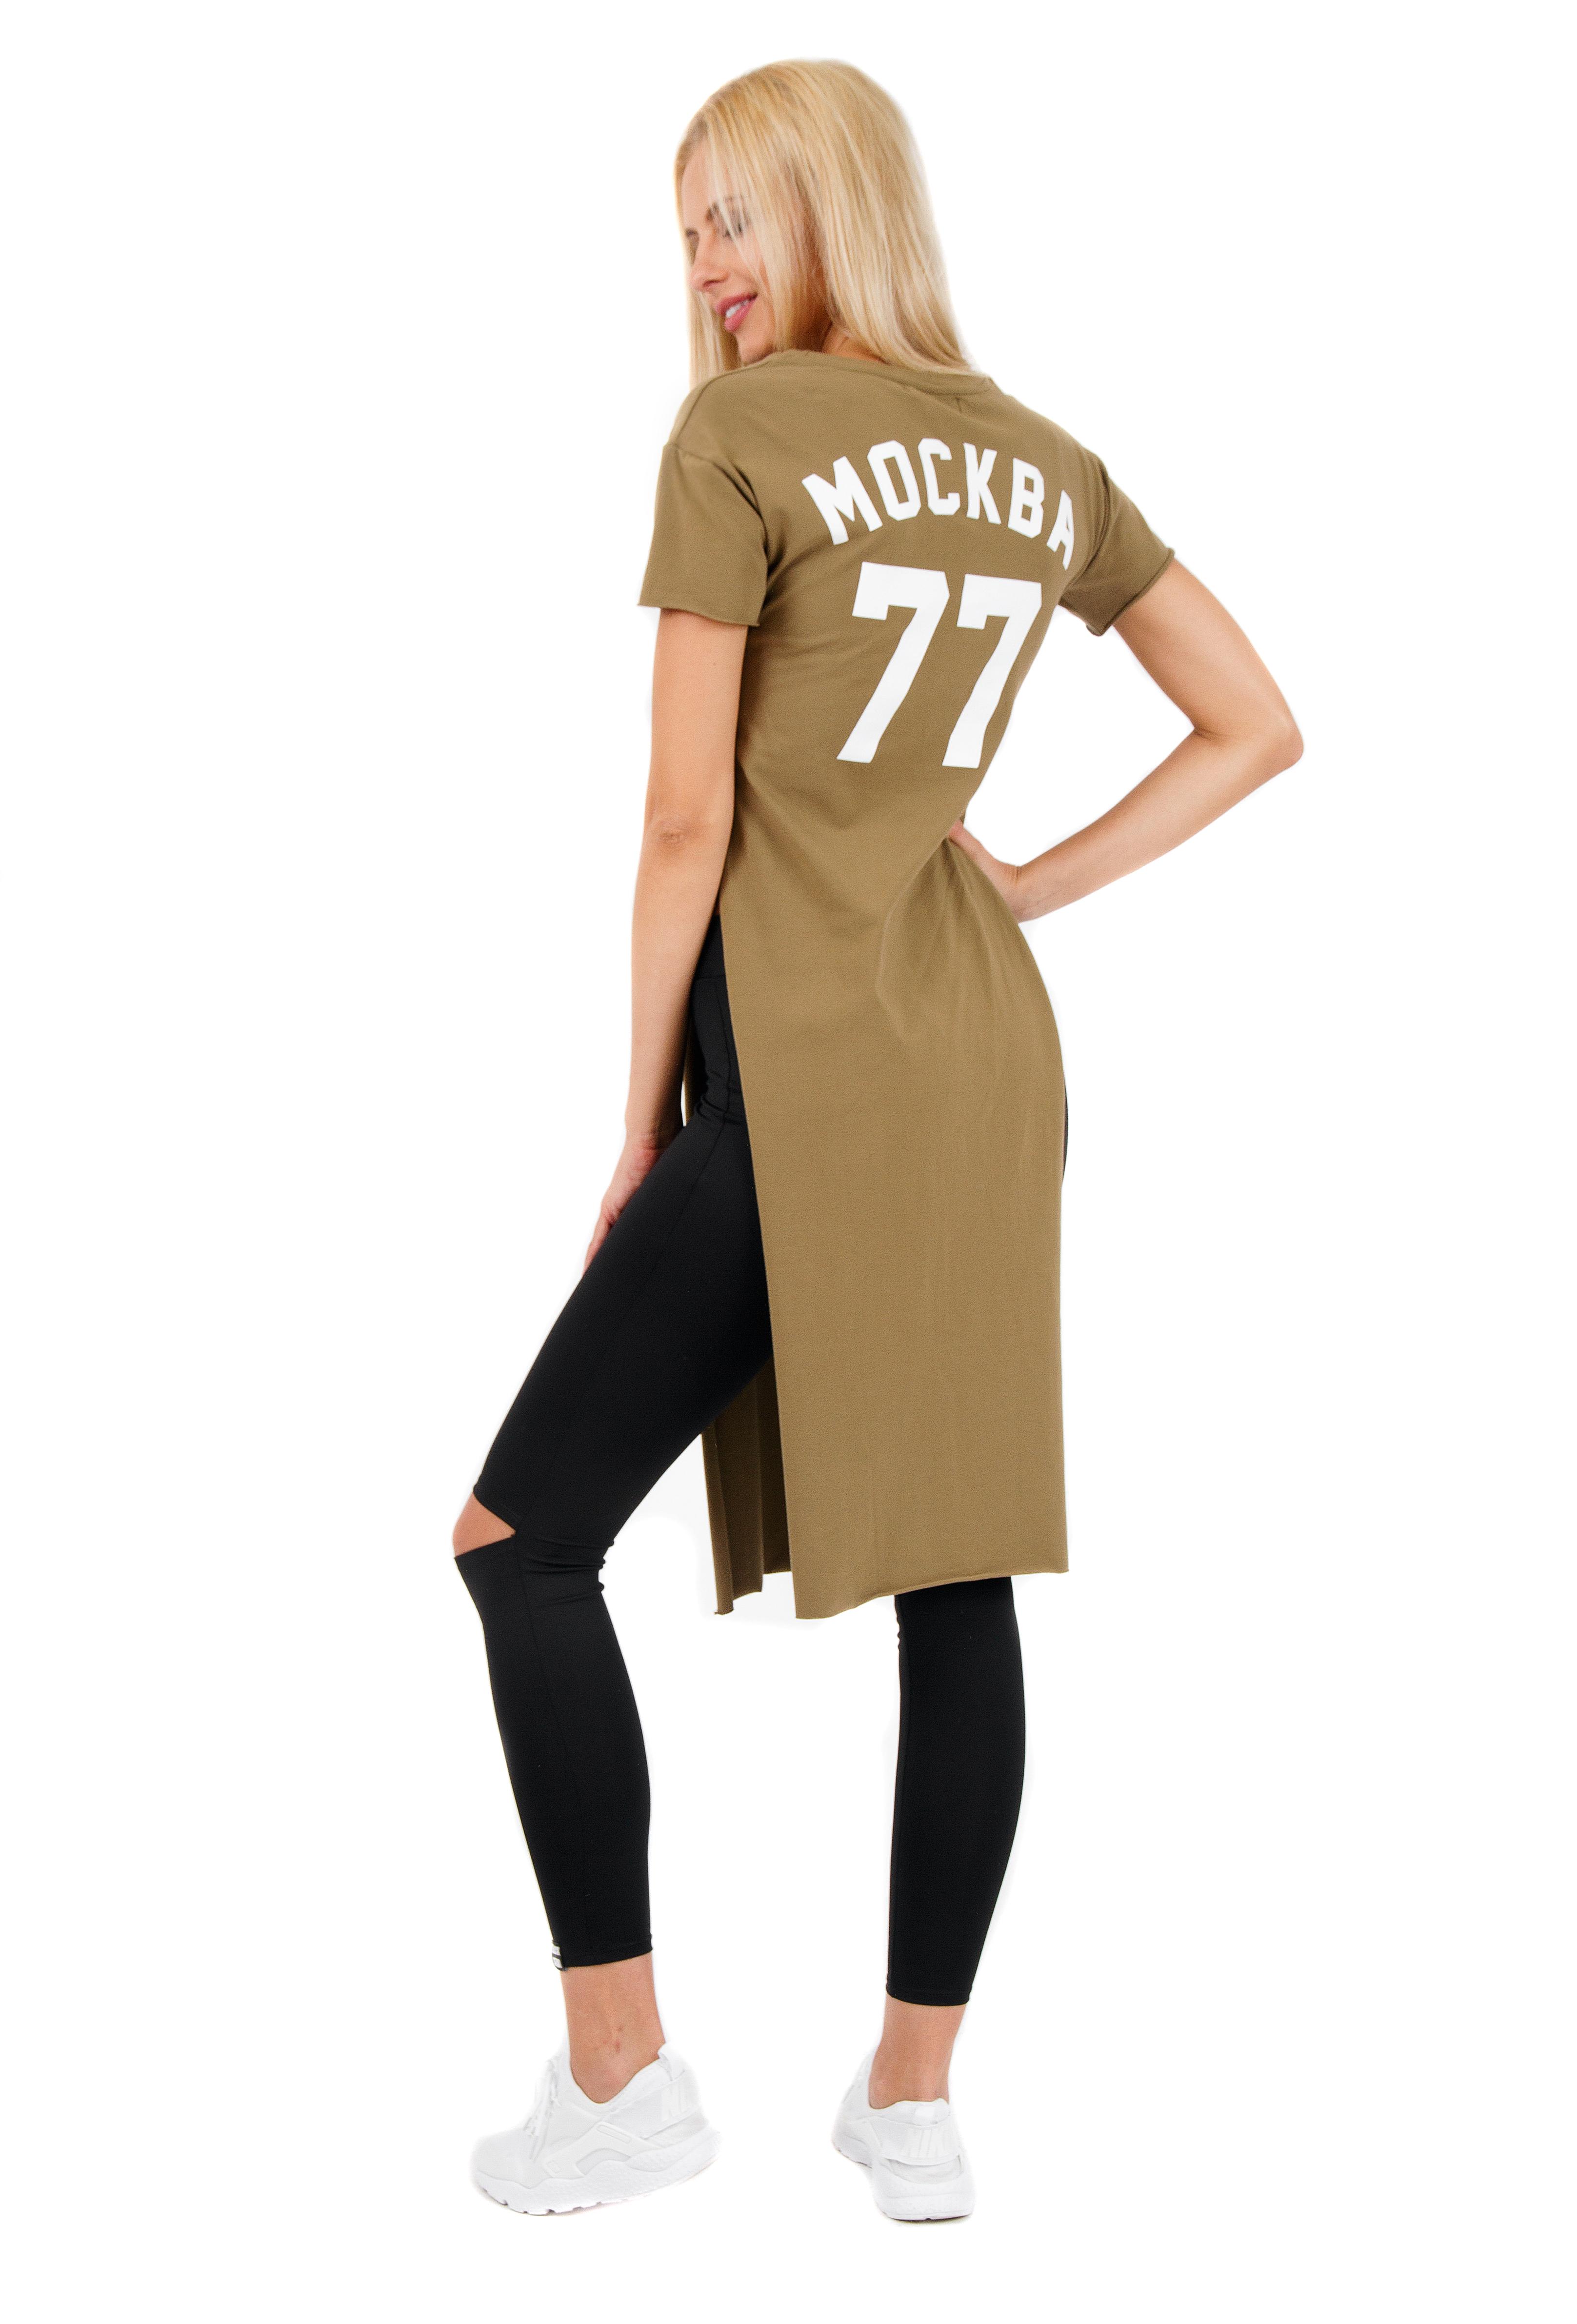 Womens tunic Moscow 77 от BlackStarWear INT